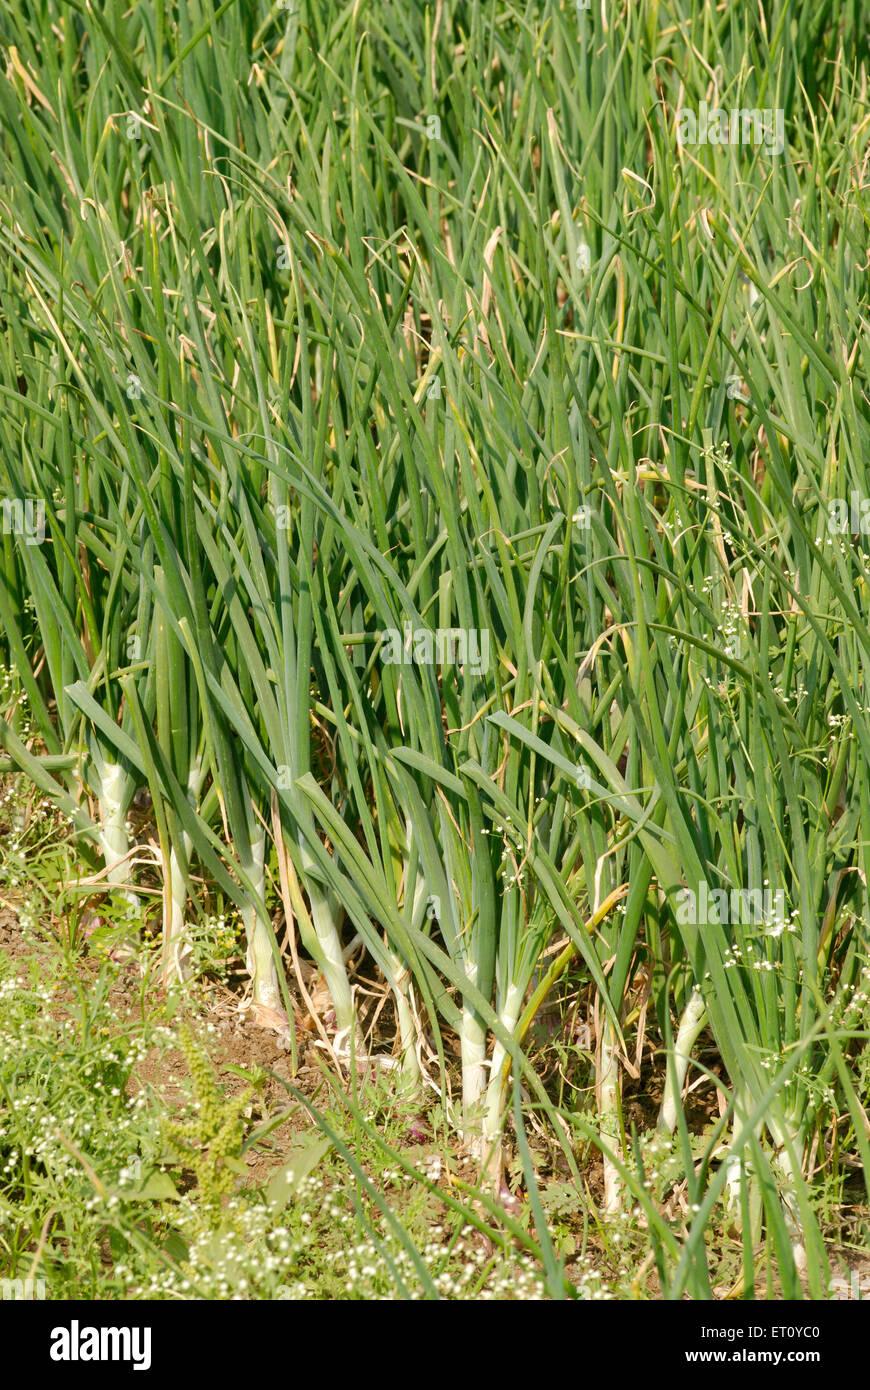 Campo de cultivo de cebolla verde exuberante verdura Donje aldea ; ; ; ; Maharashtra India Pune Foto de stock